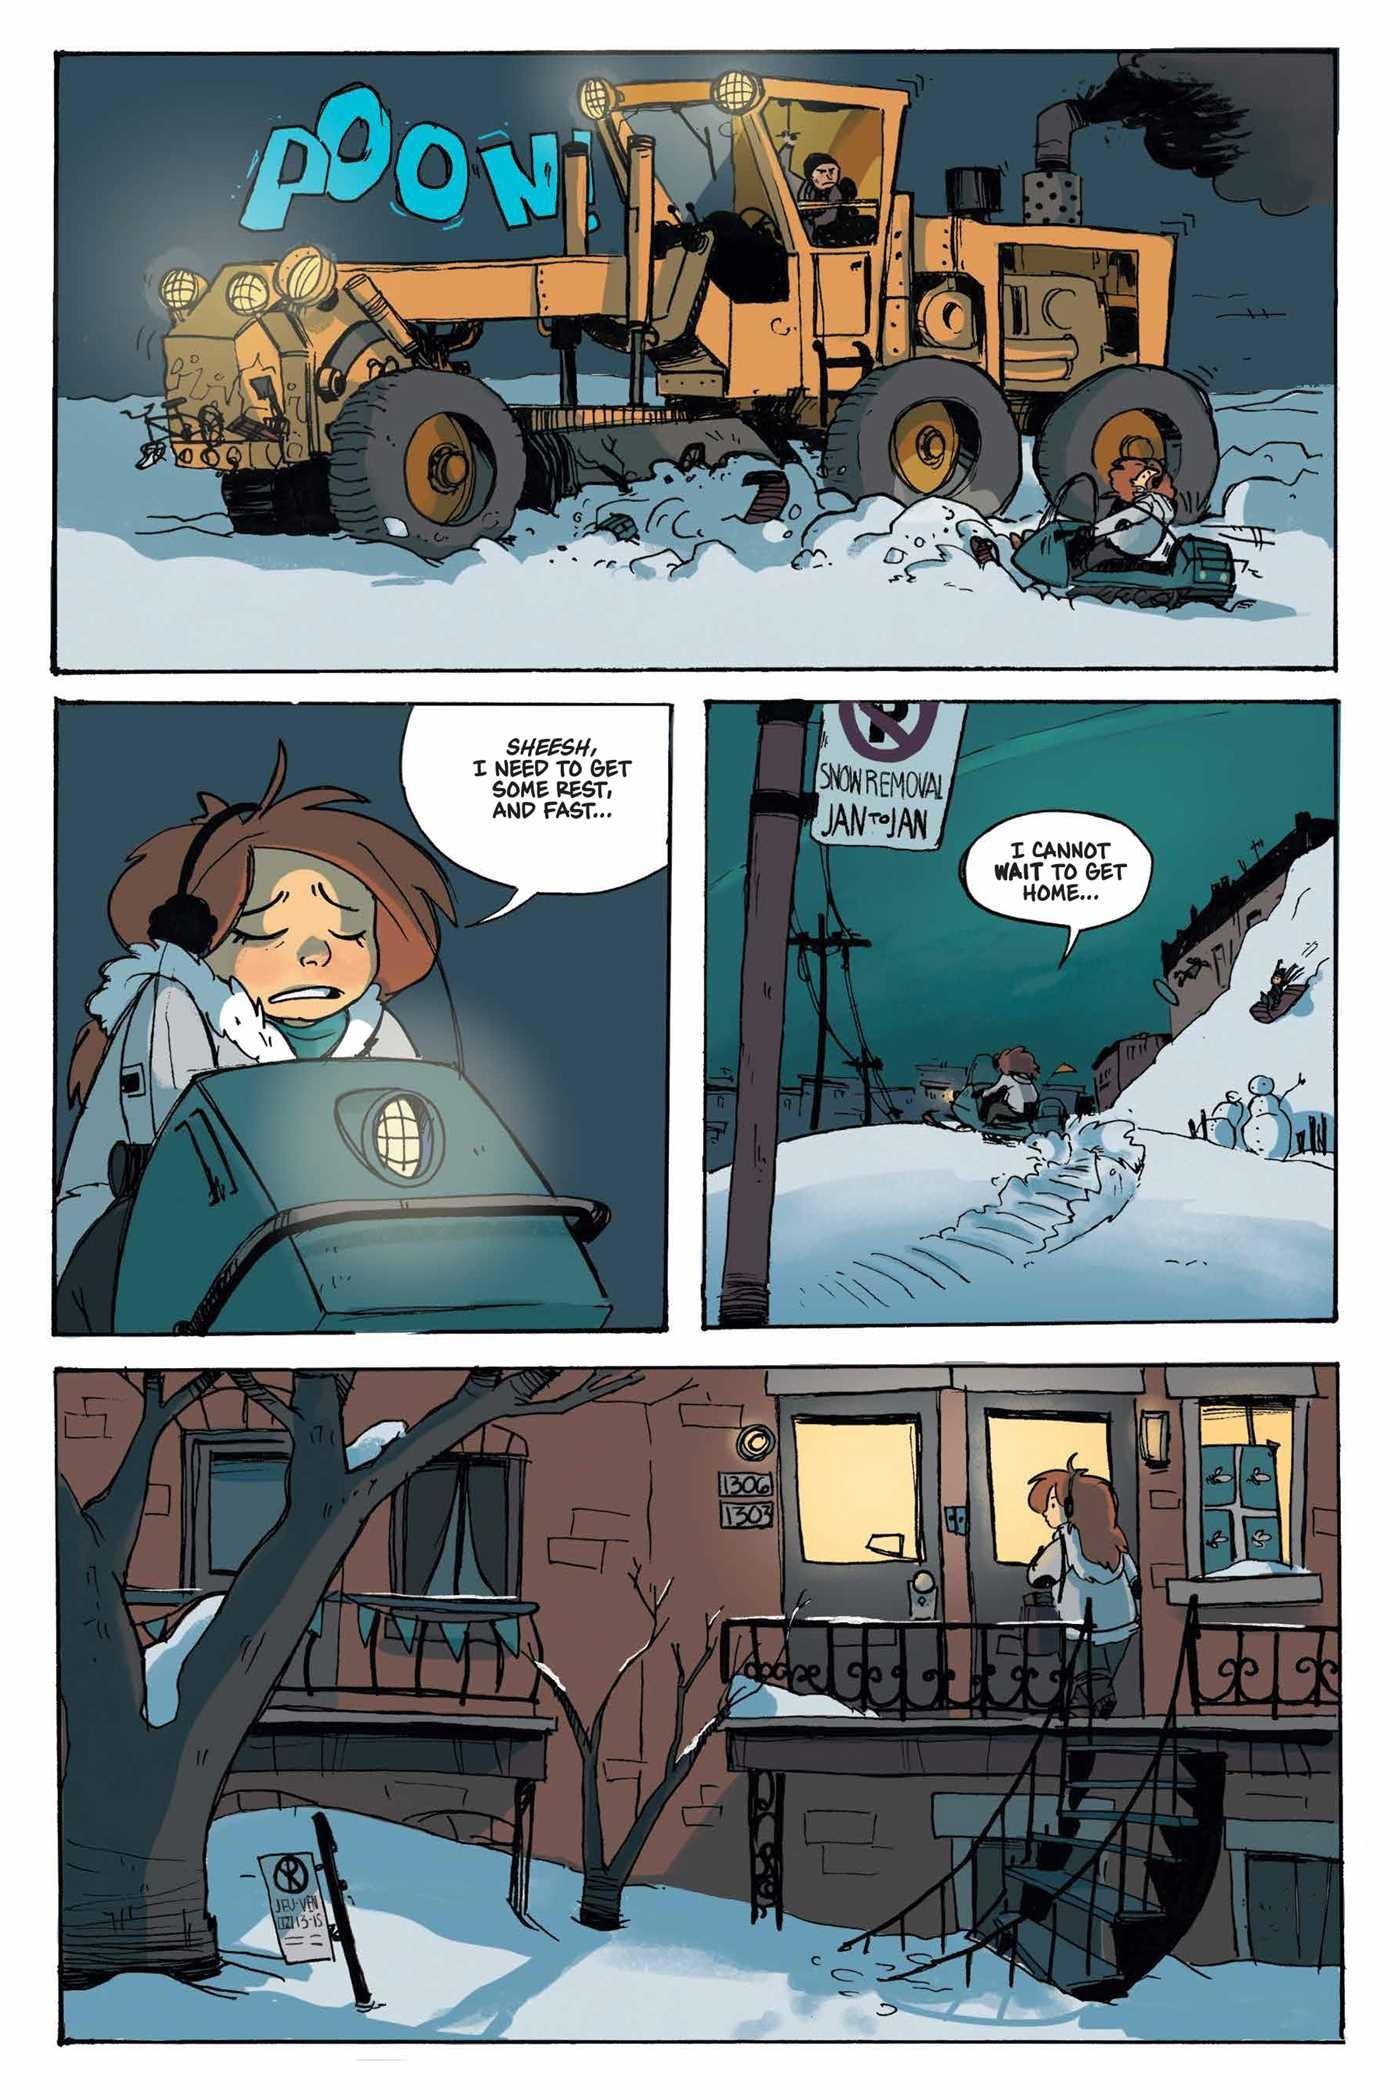 Nuclear winter vol 1 9781684151639.in03